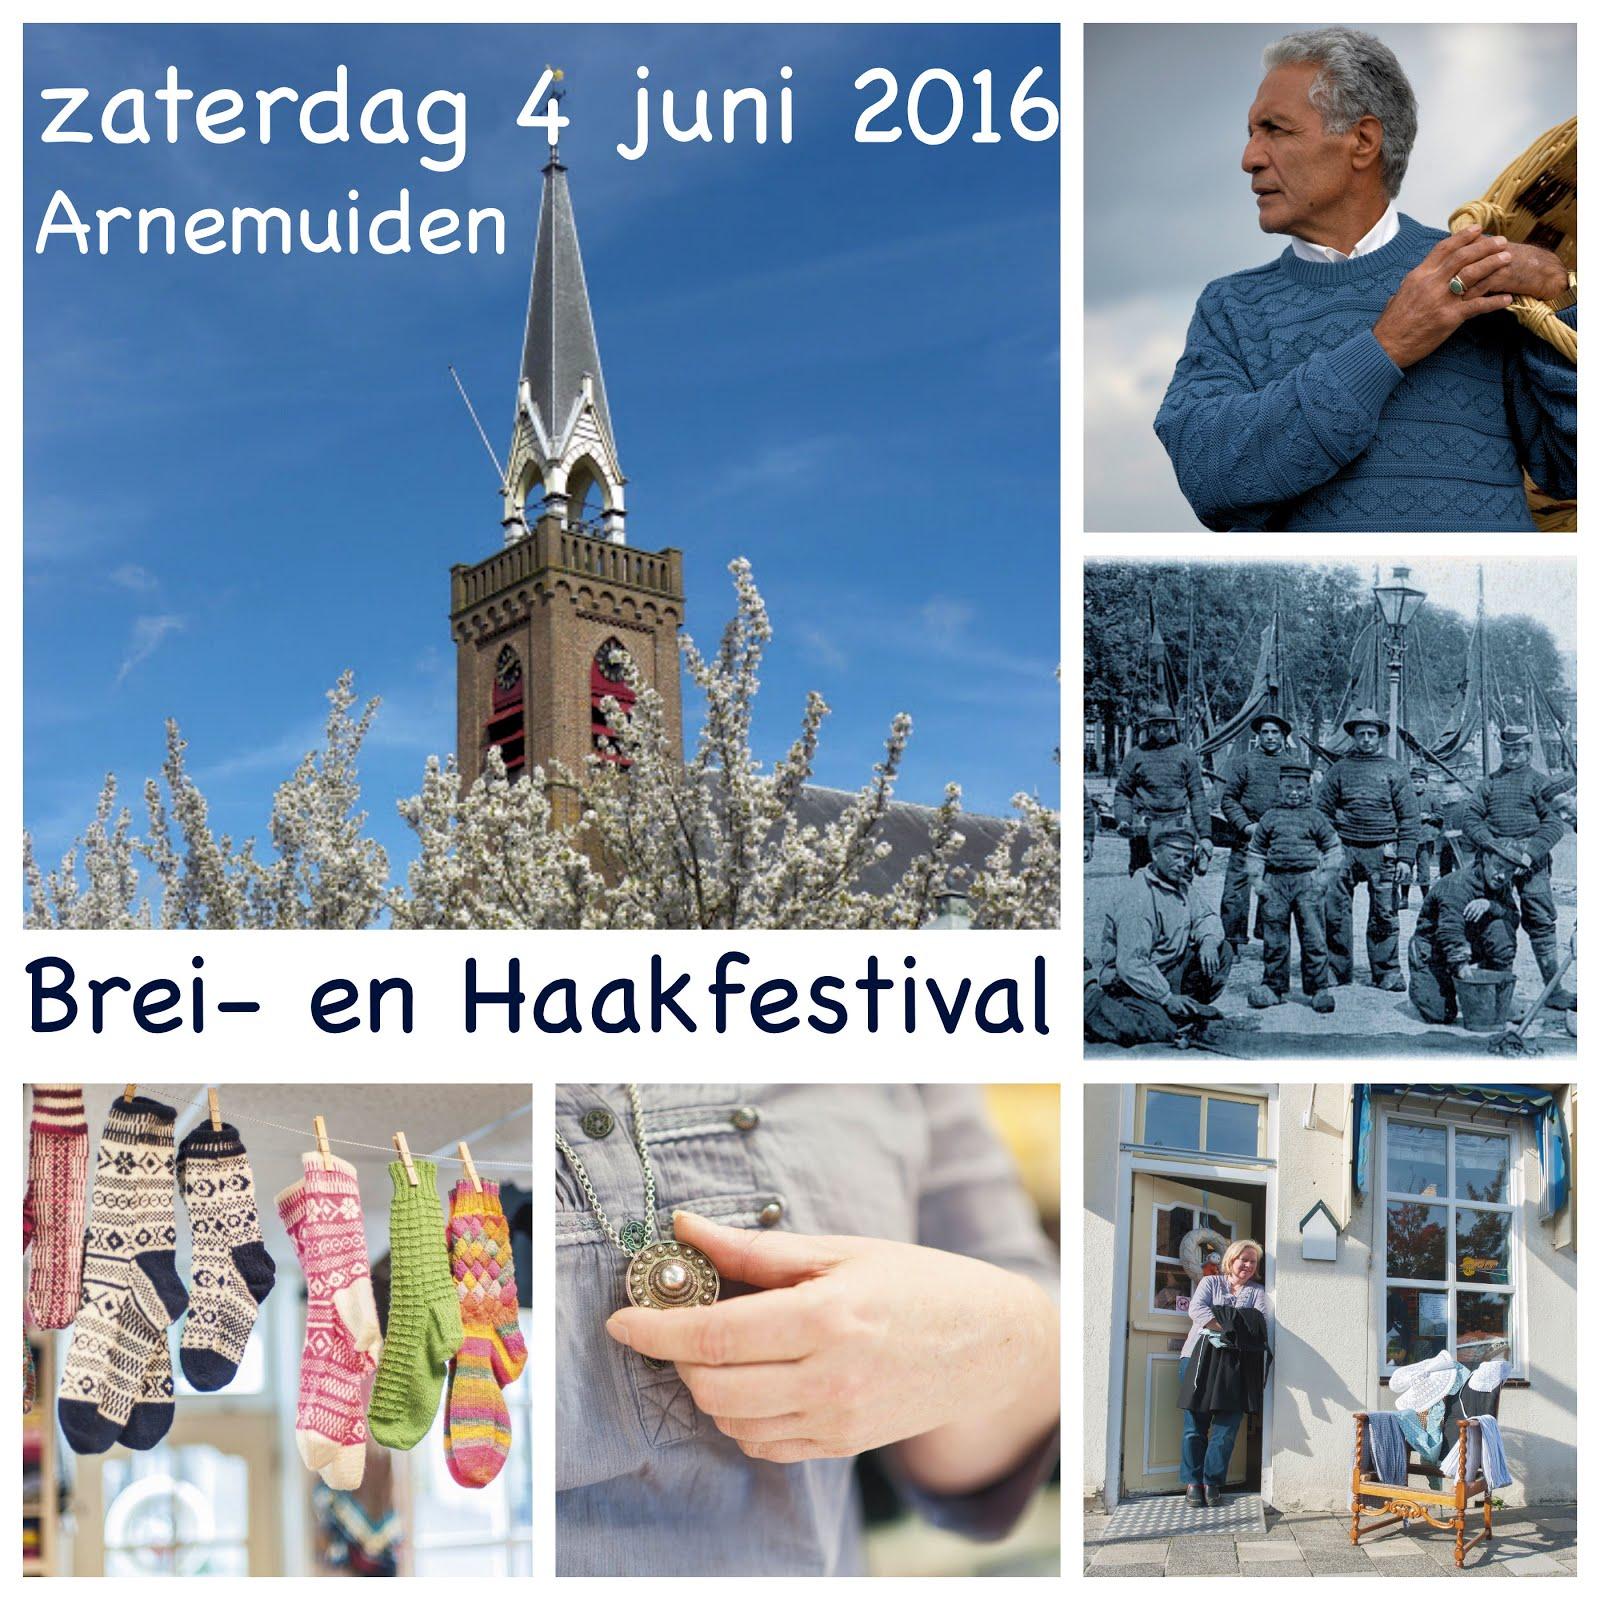 Brei- en Haakfestival Arnemuiden